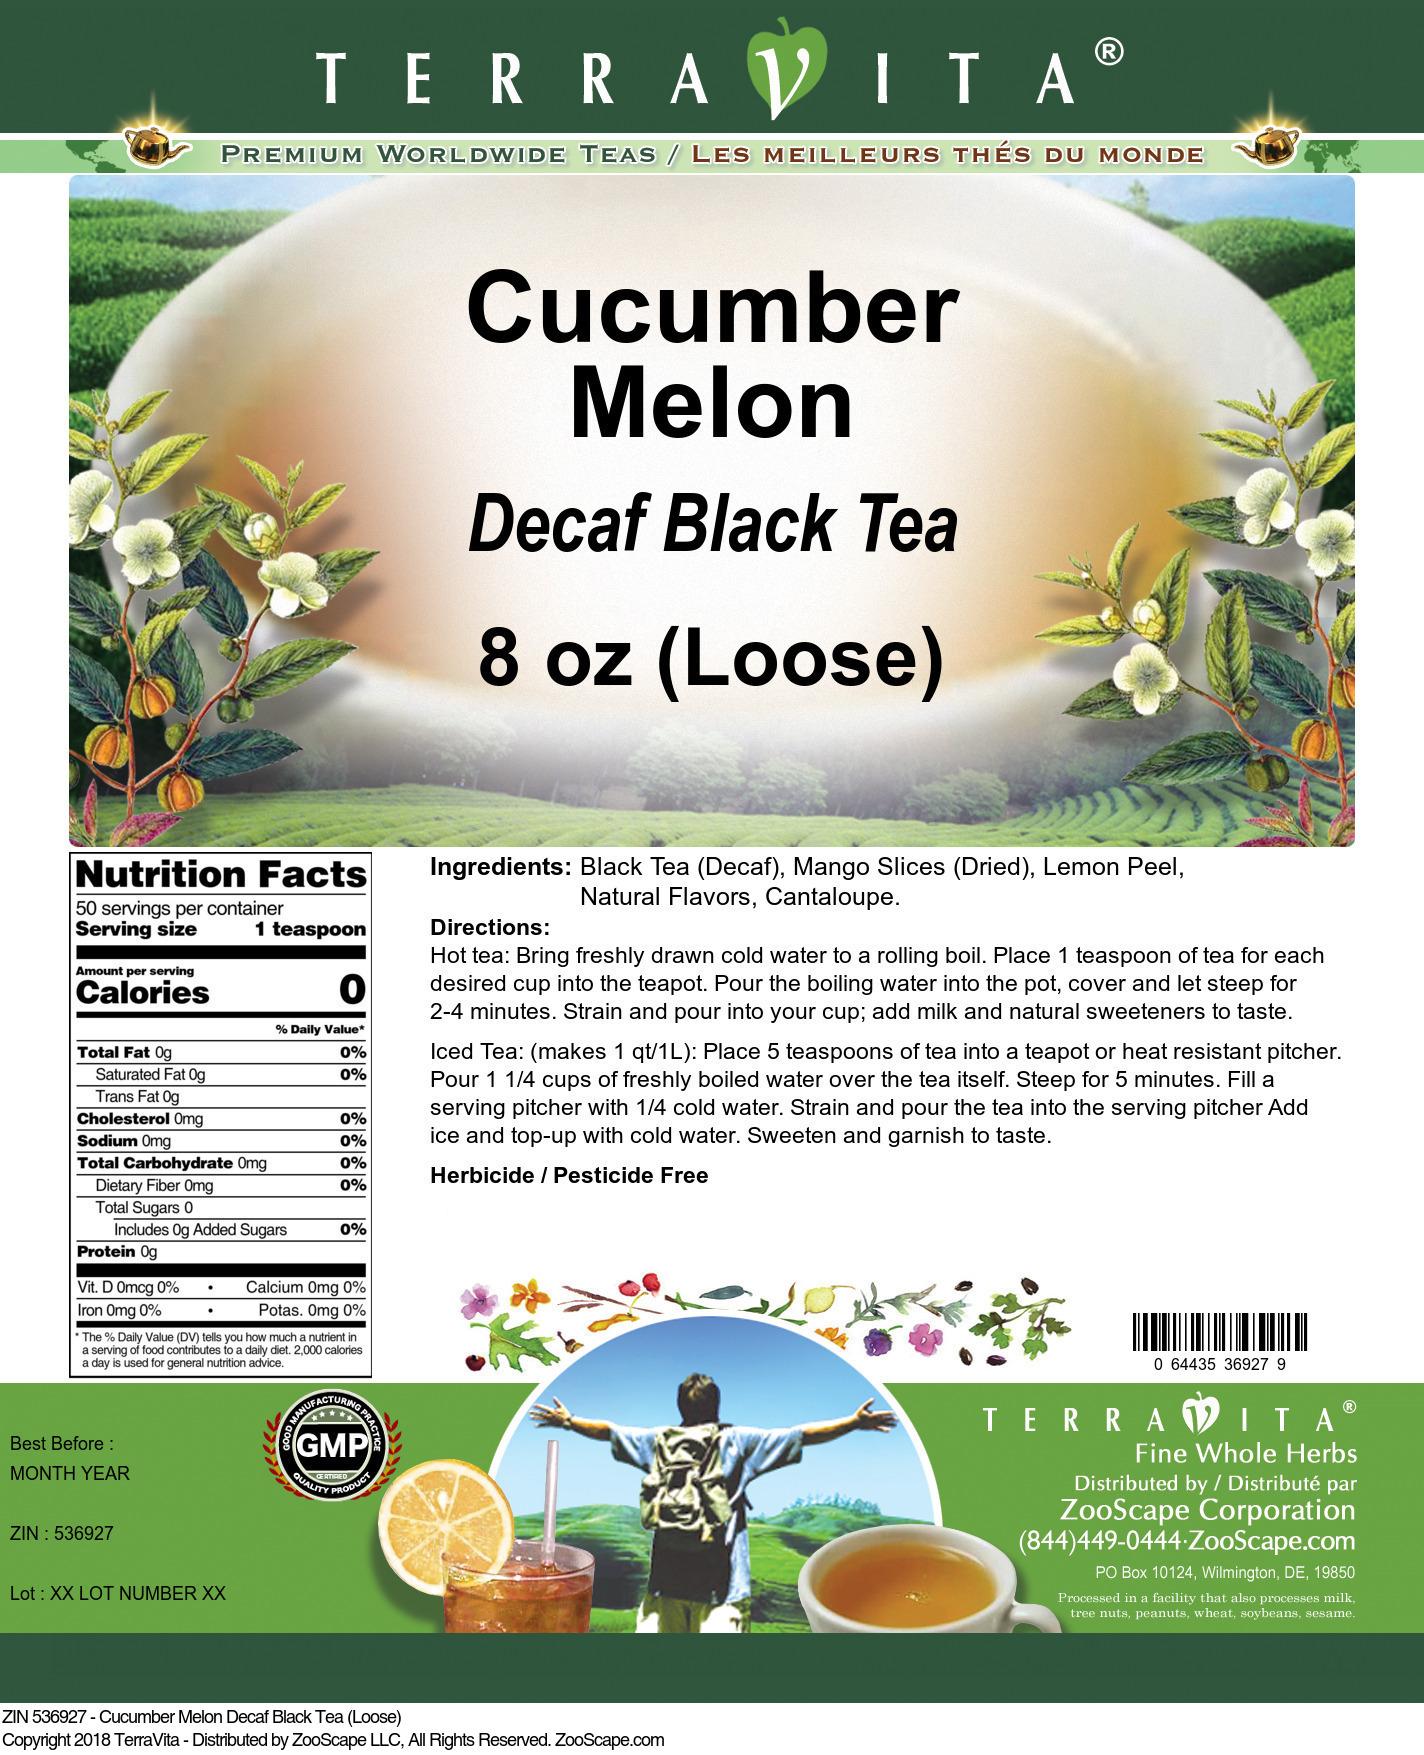 Cucumber Melon Decaf Black Tea (Loose)